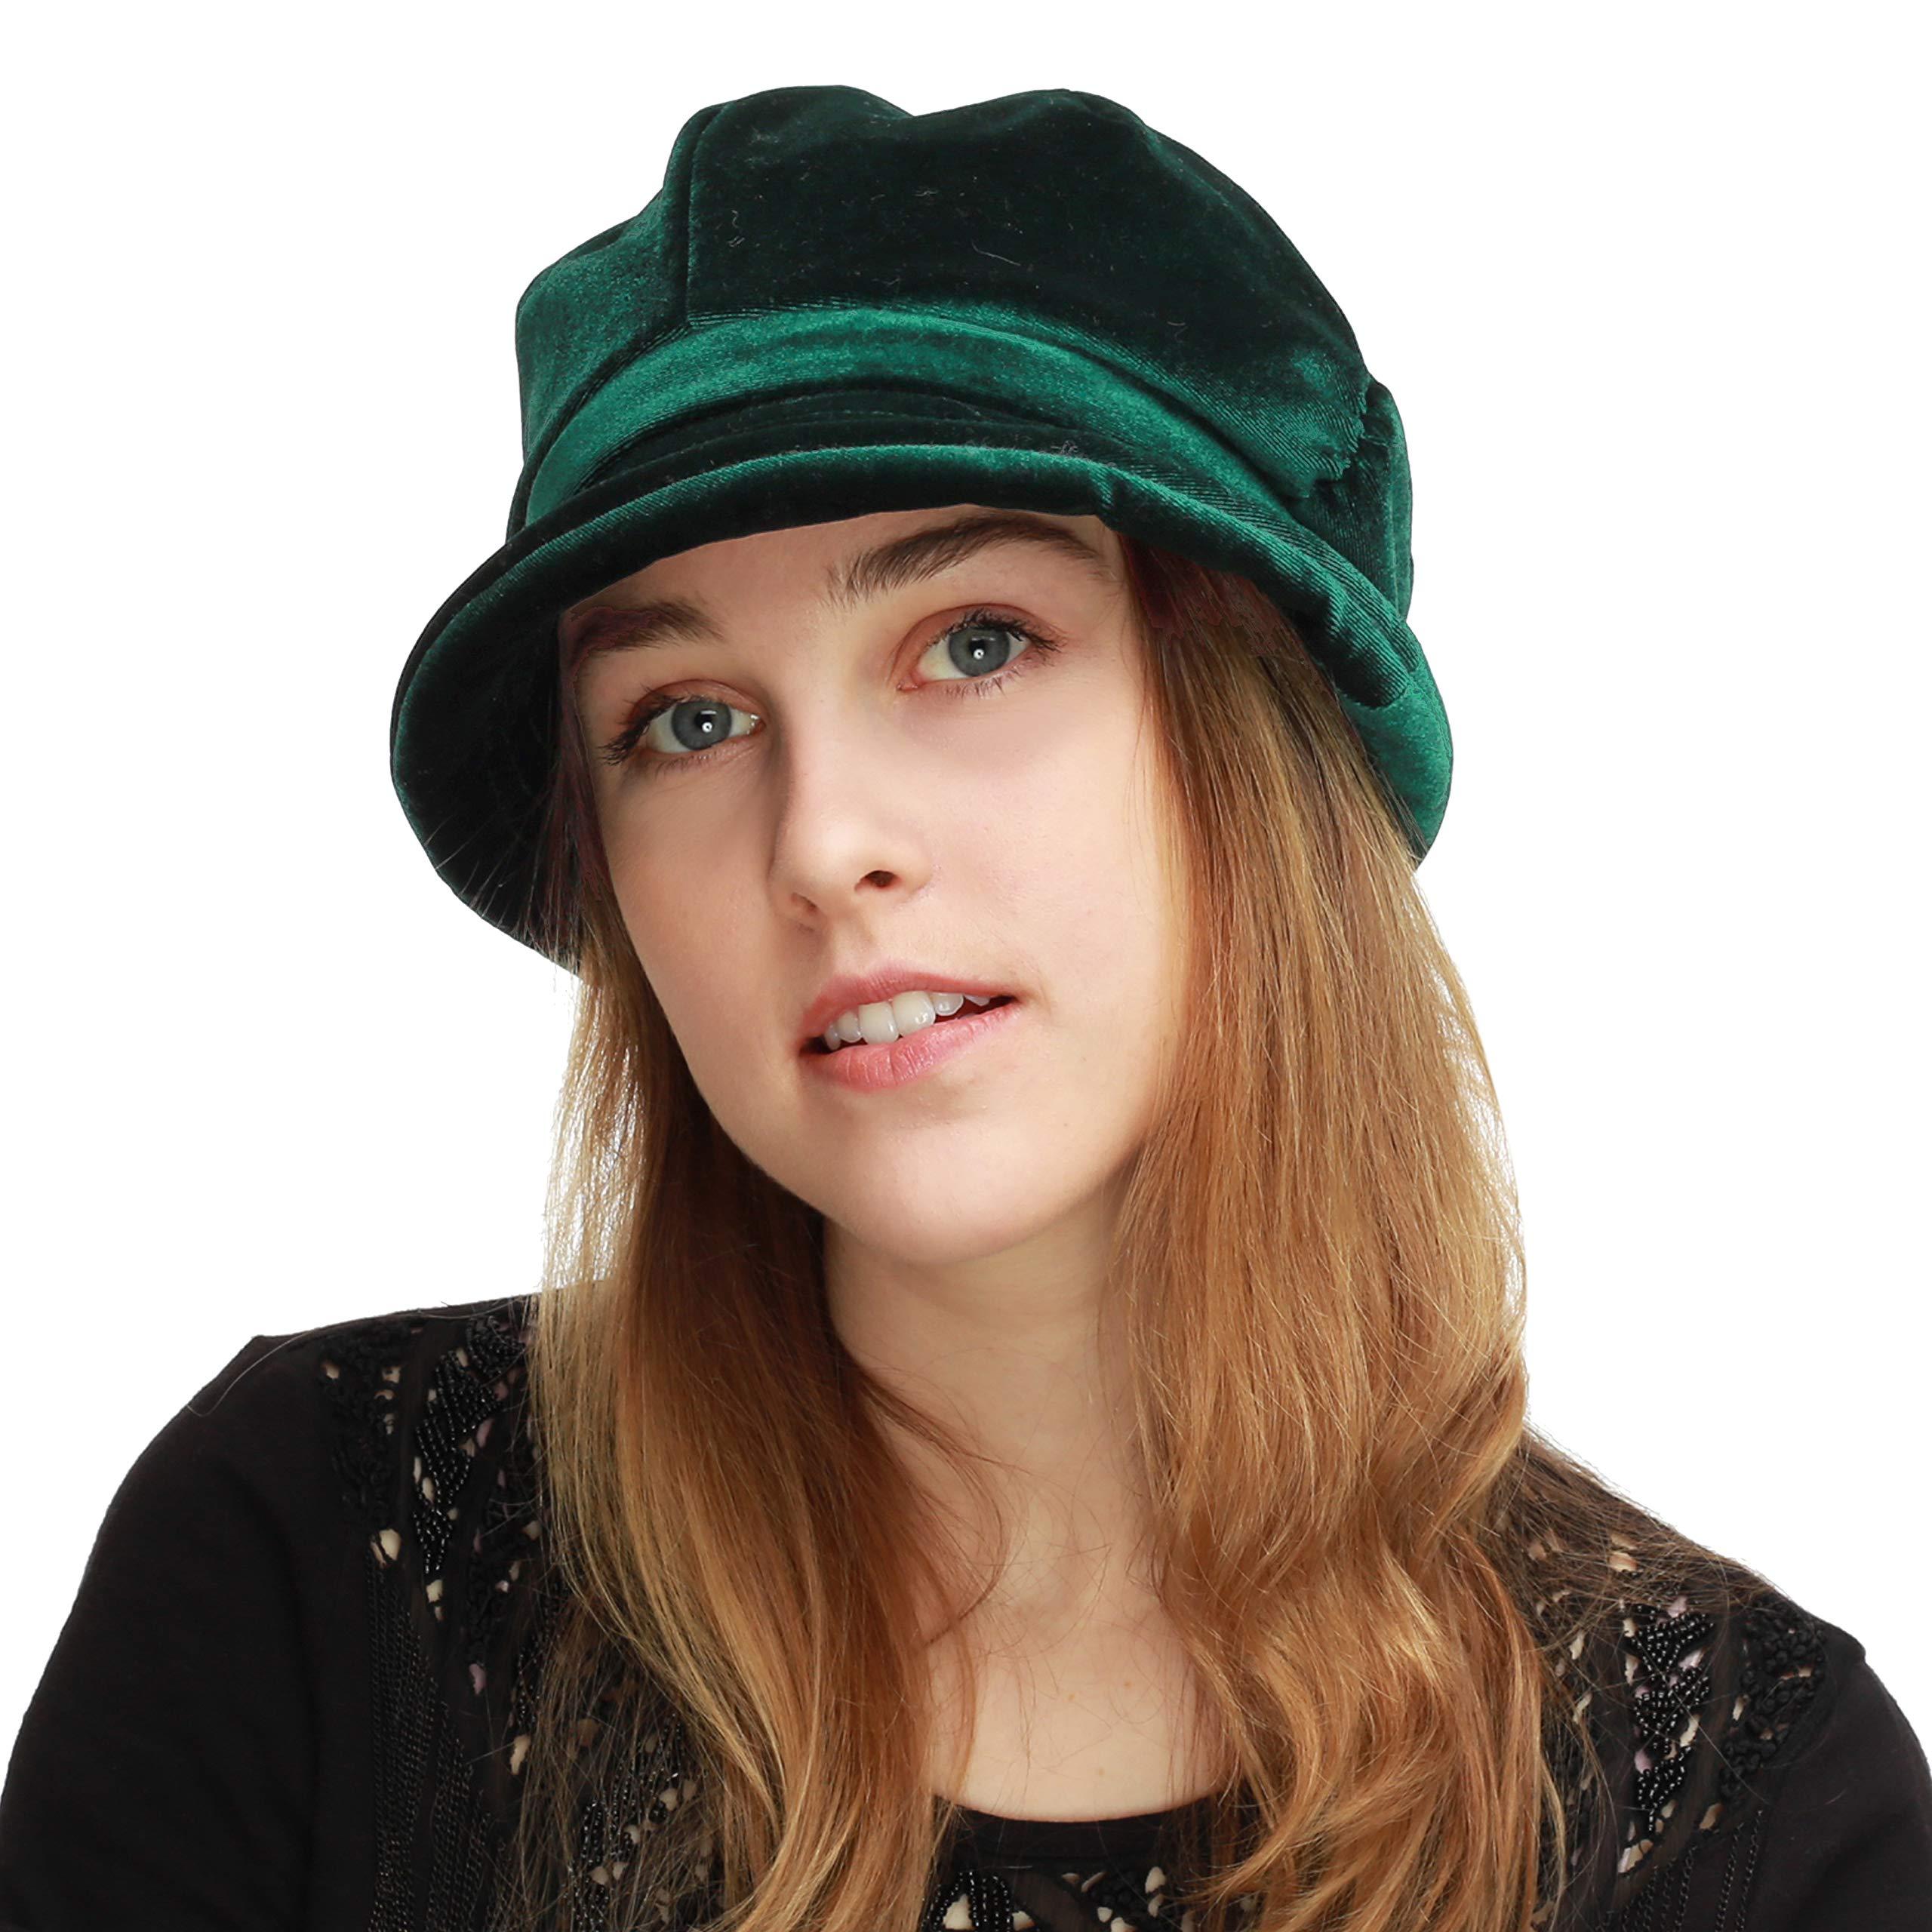 BLACK HORN Womens Newsboy Cabbie Beret Cap Cloche Visor Hats (Velvet-Green)